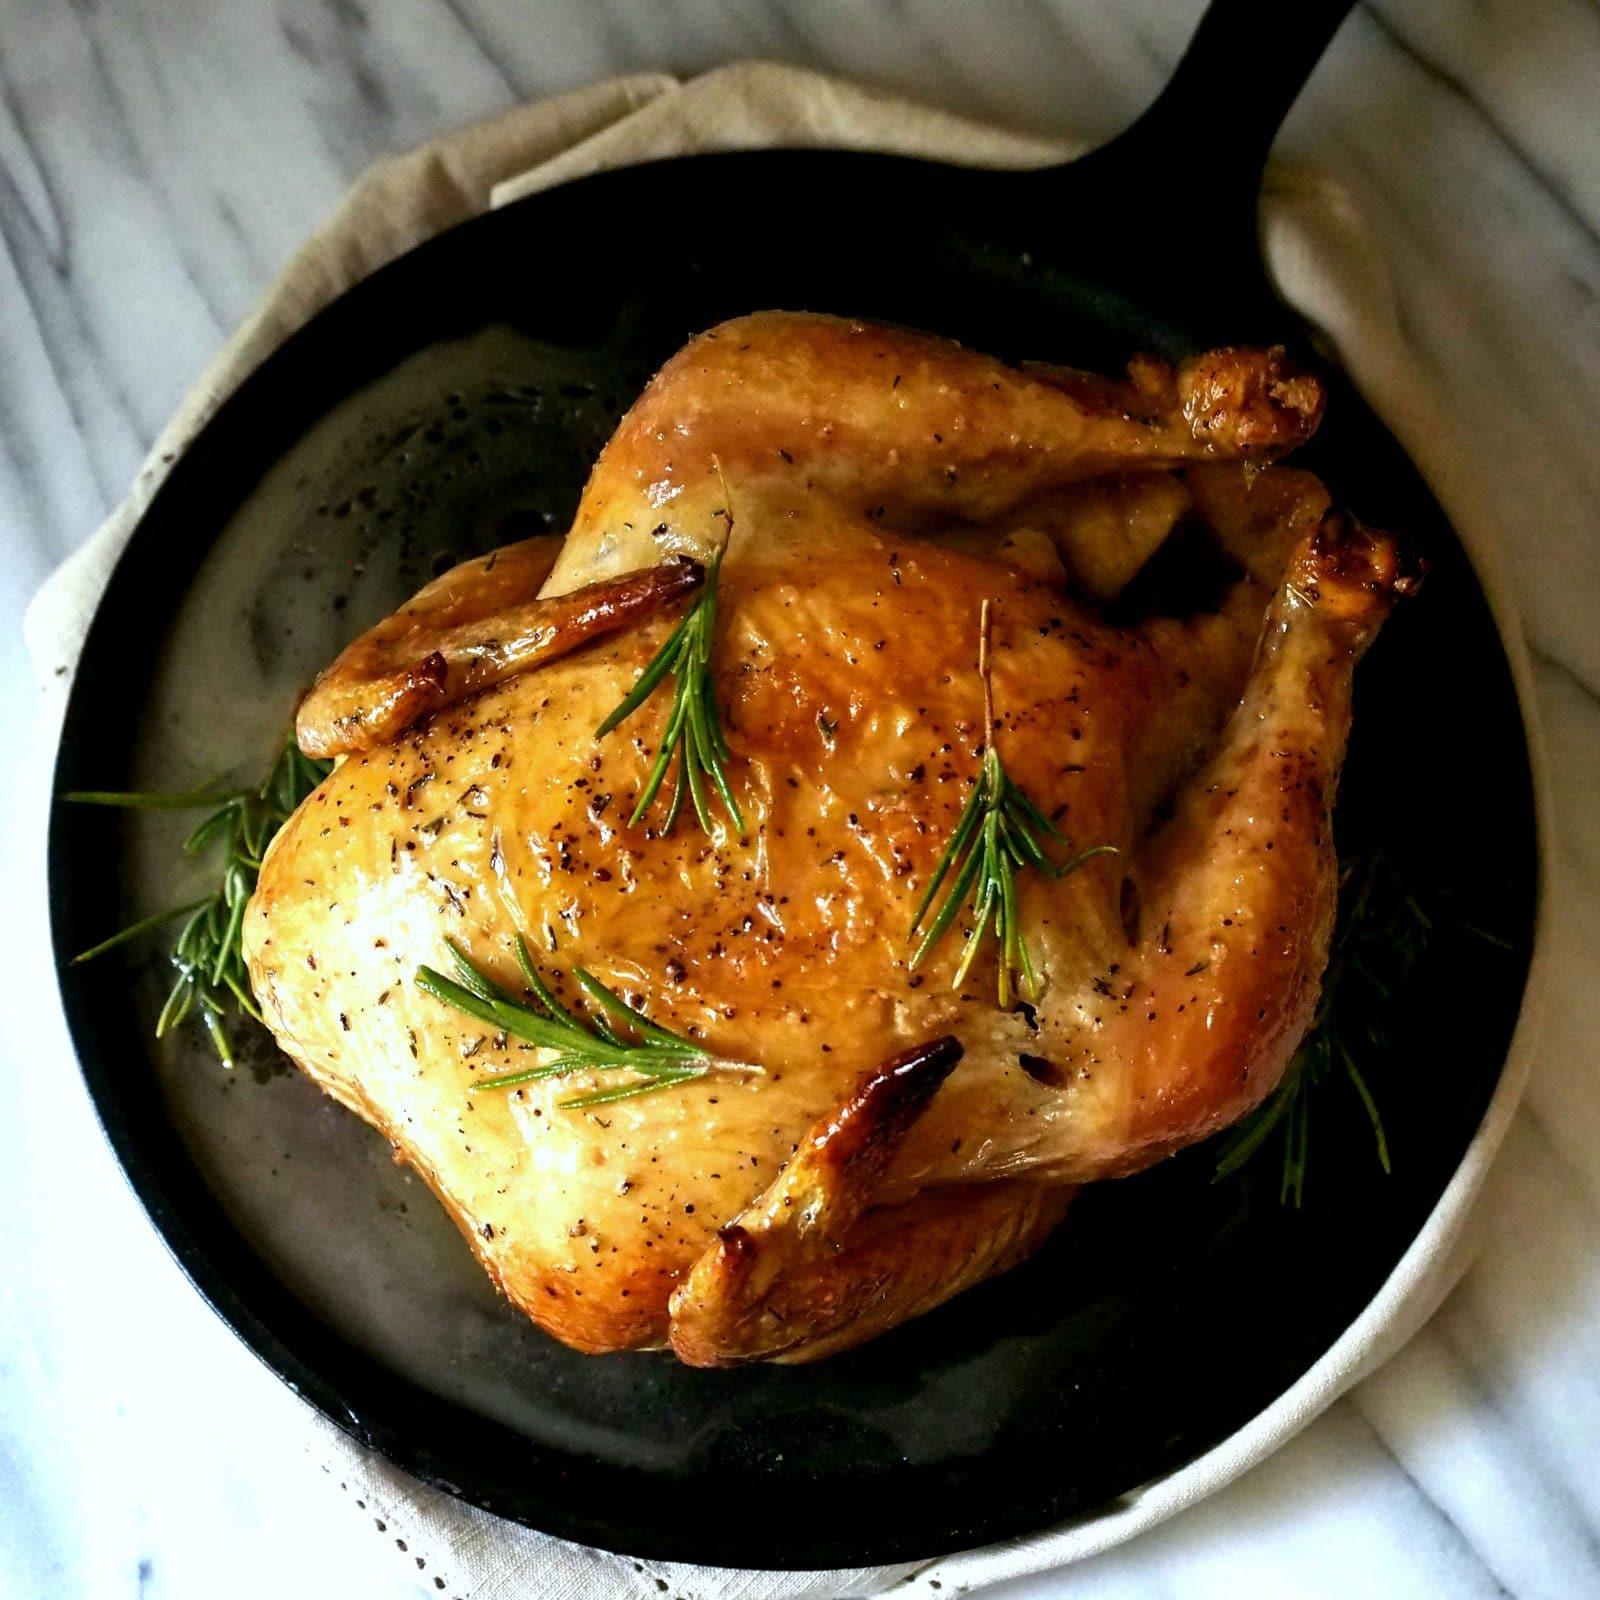 ... Thomas Keller's Favorite Simple Roast Chicken , scrumptiously simple